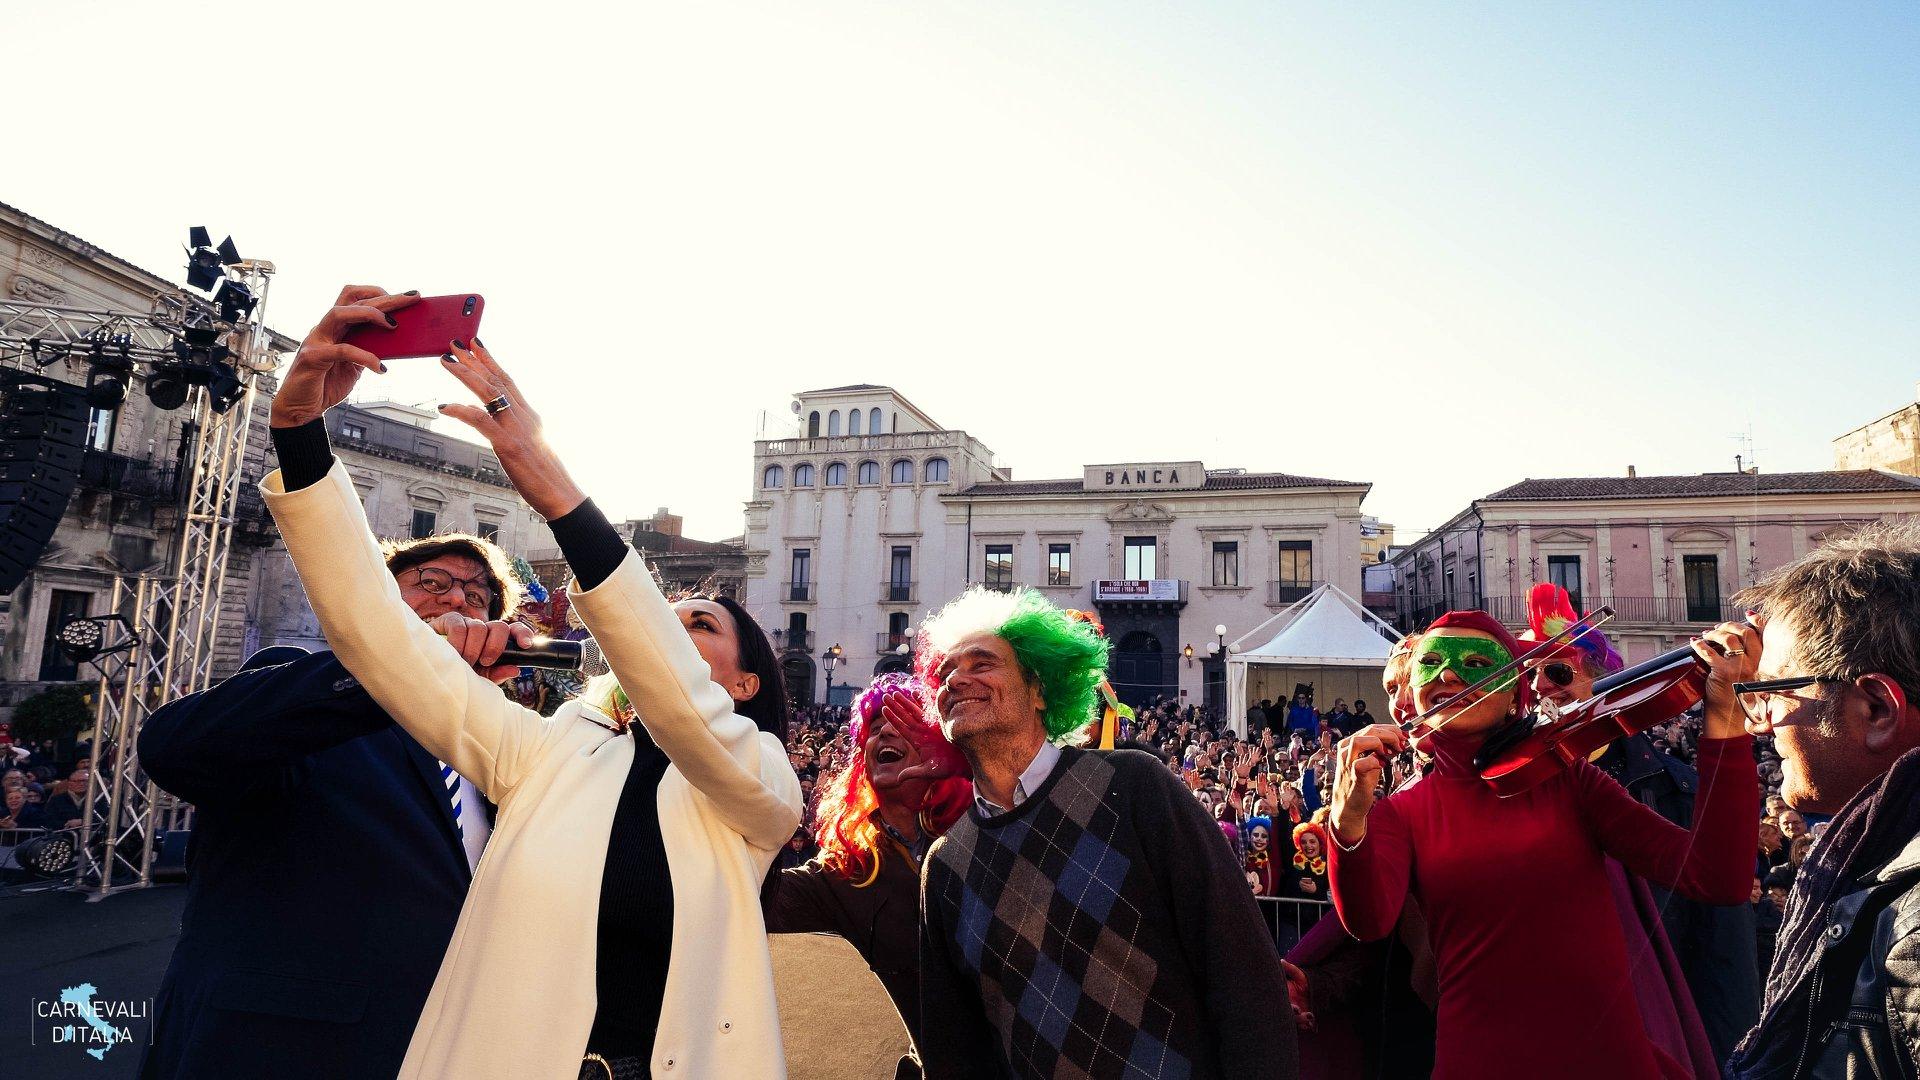 Carnevale Acireale 2019